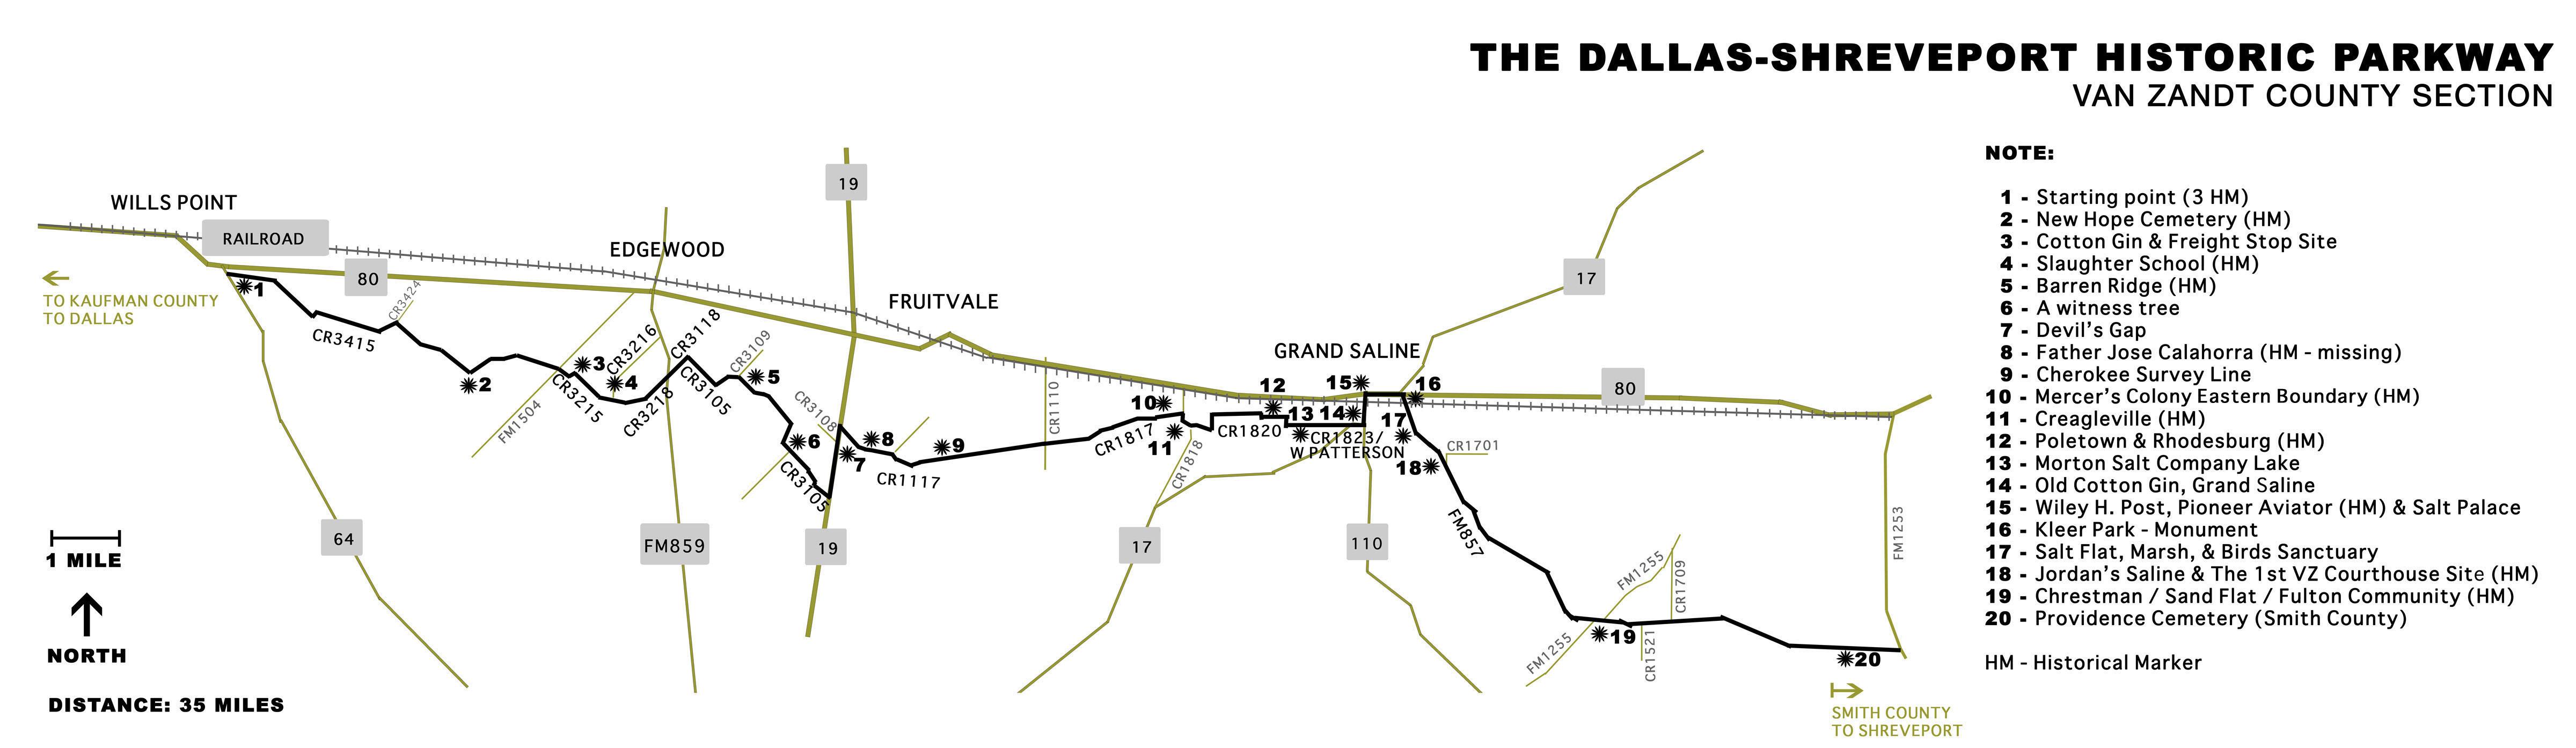 Discover 300 Years Of History In 35 Miles In Van Zandt County, Texas - Van Zandt County Texas Map